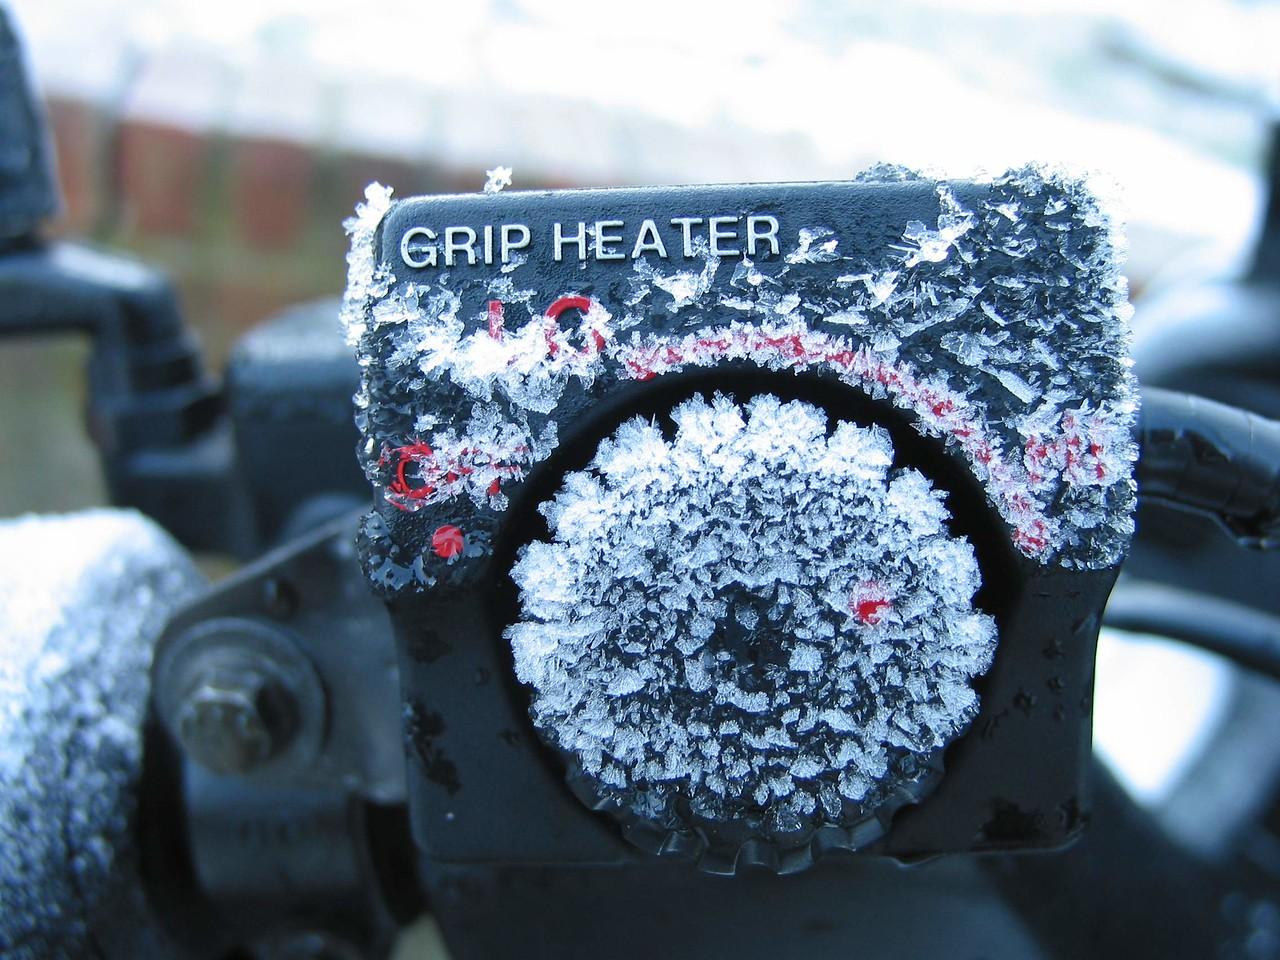 Unheated heater control!